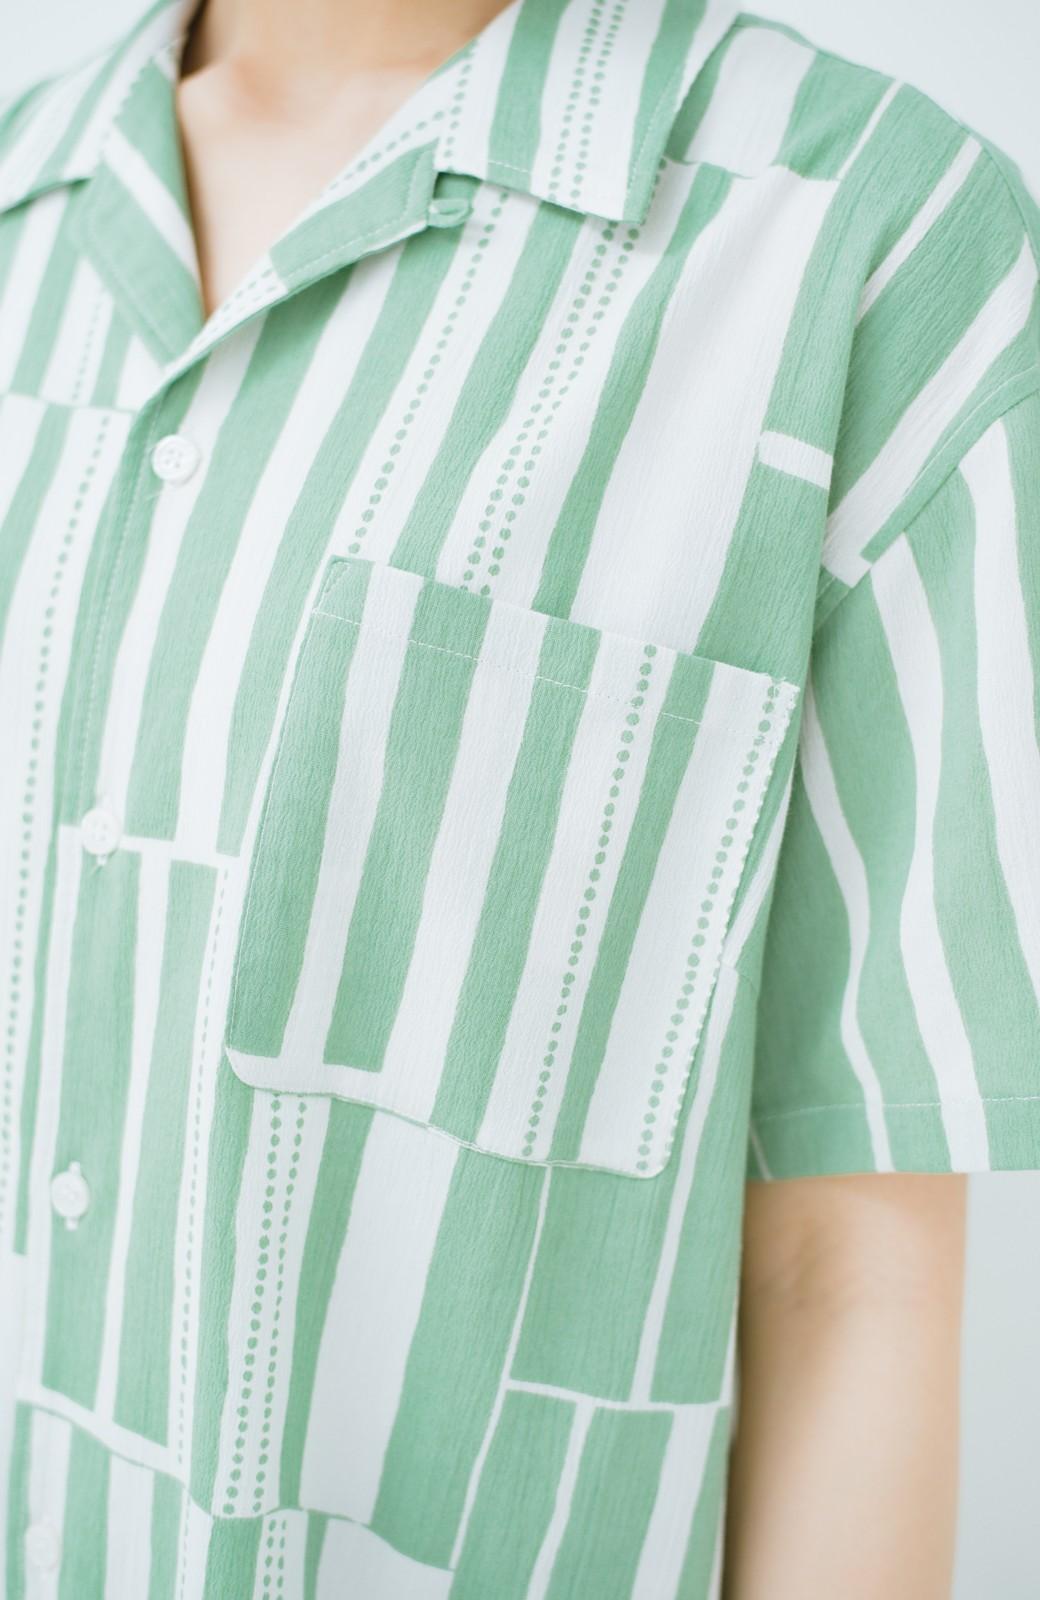 haco! 京都の浴衣屋さんと作った浴衣生地のシャツワンピース <グリーン系その他>の商品写真7